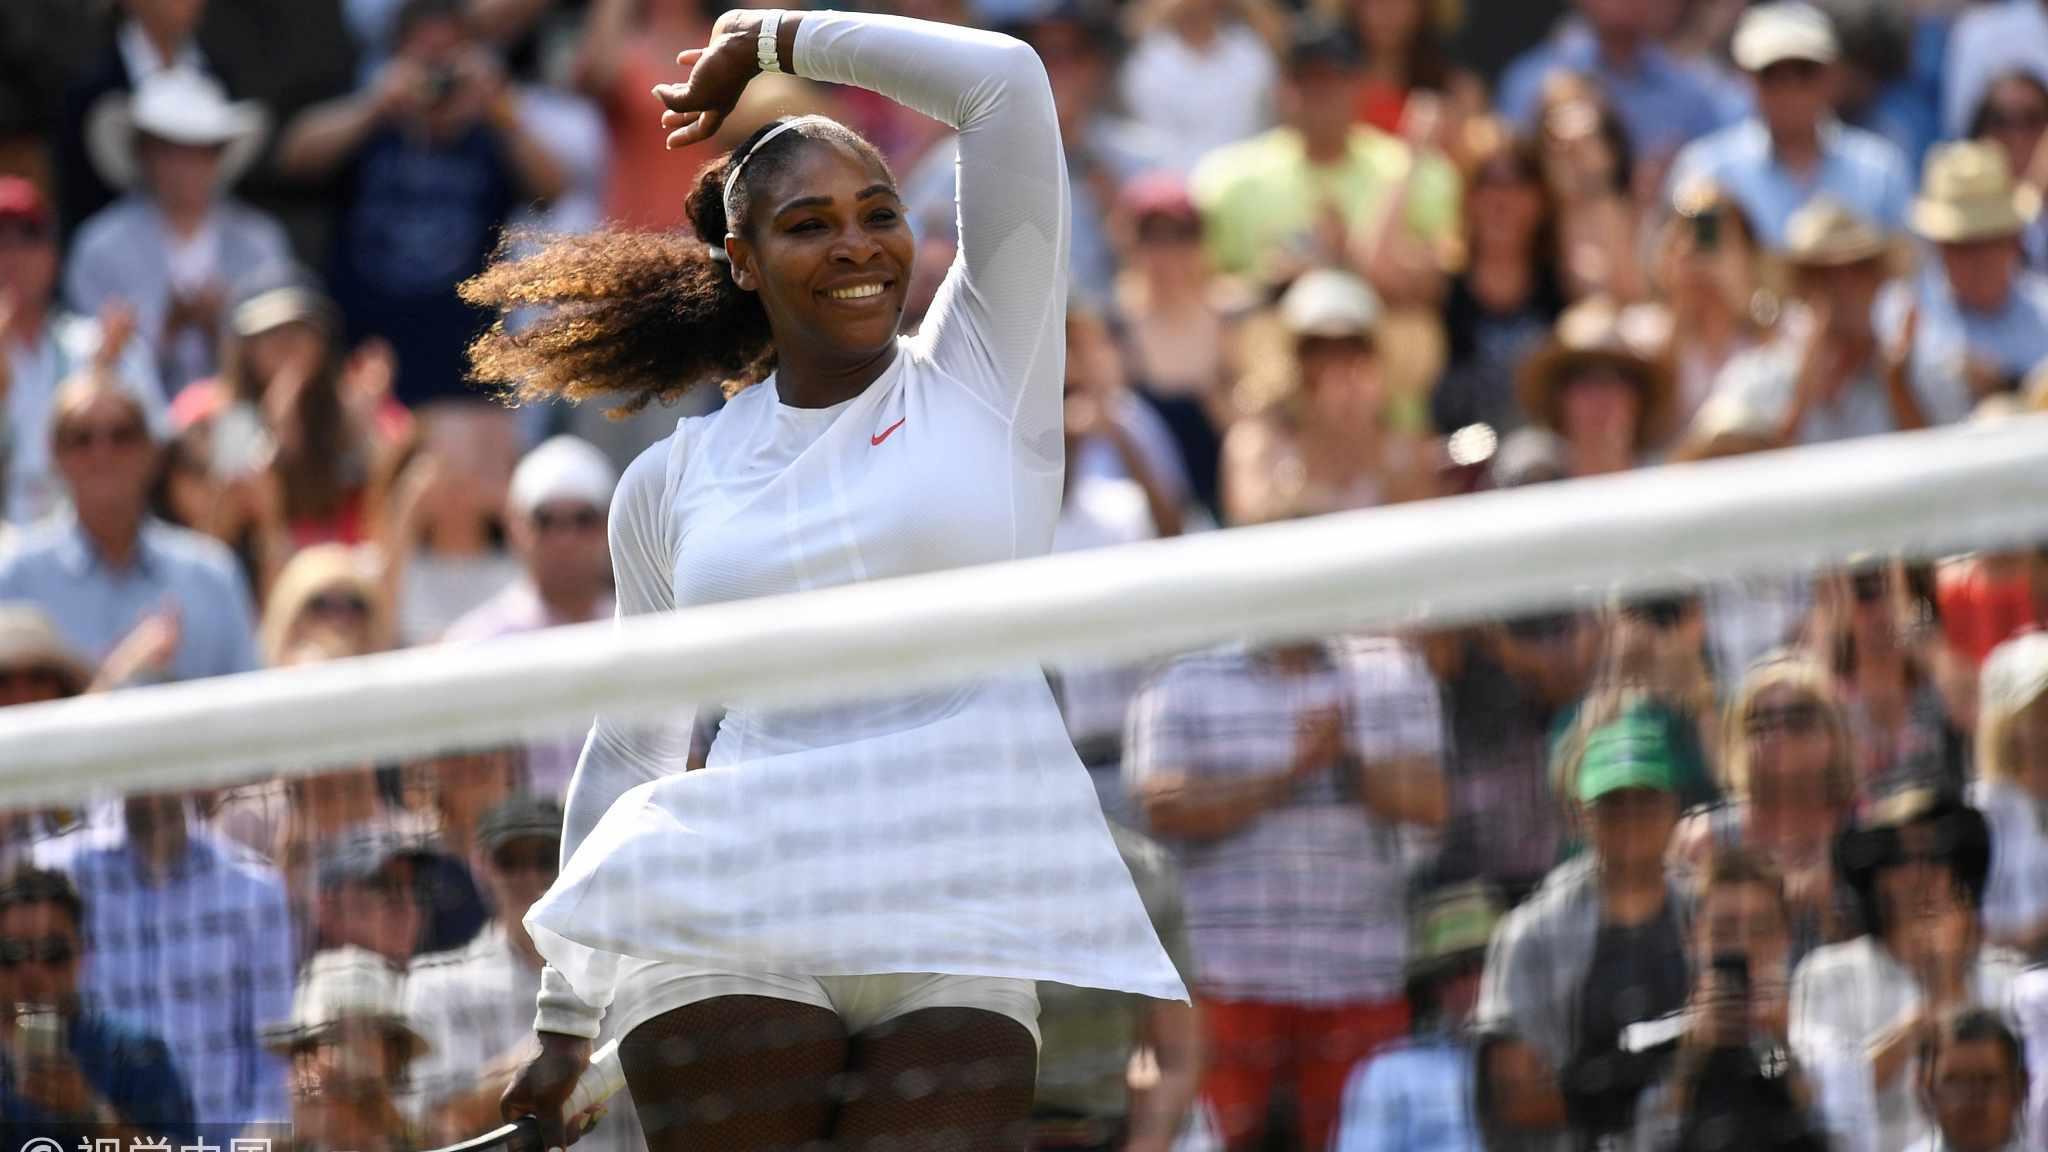 Untouchable Serena extends Sharapova dominance at US Open